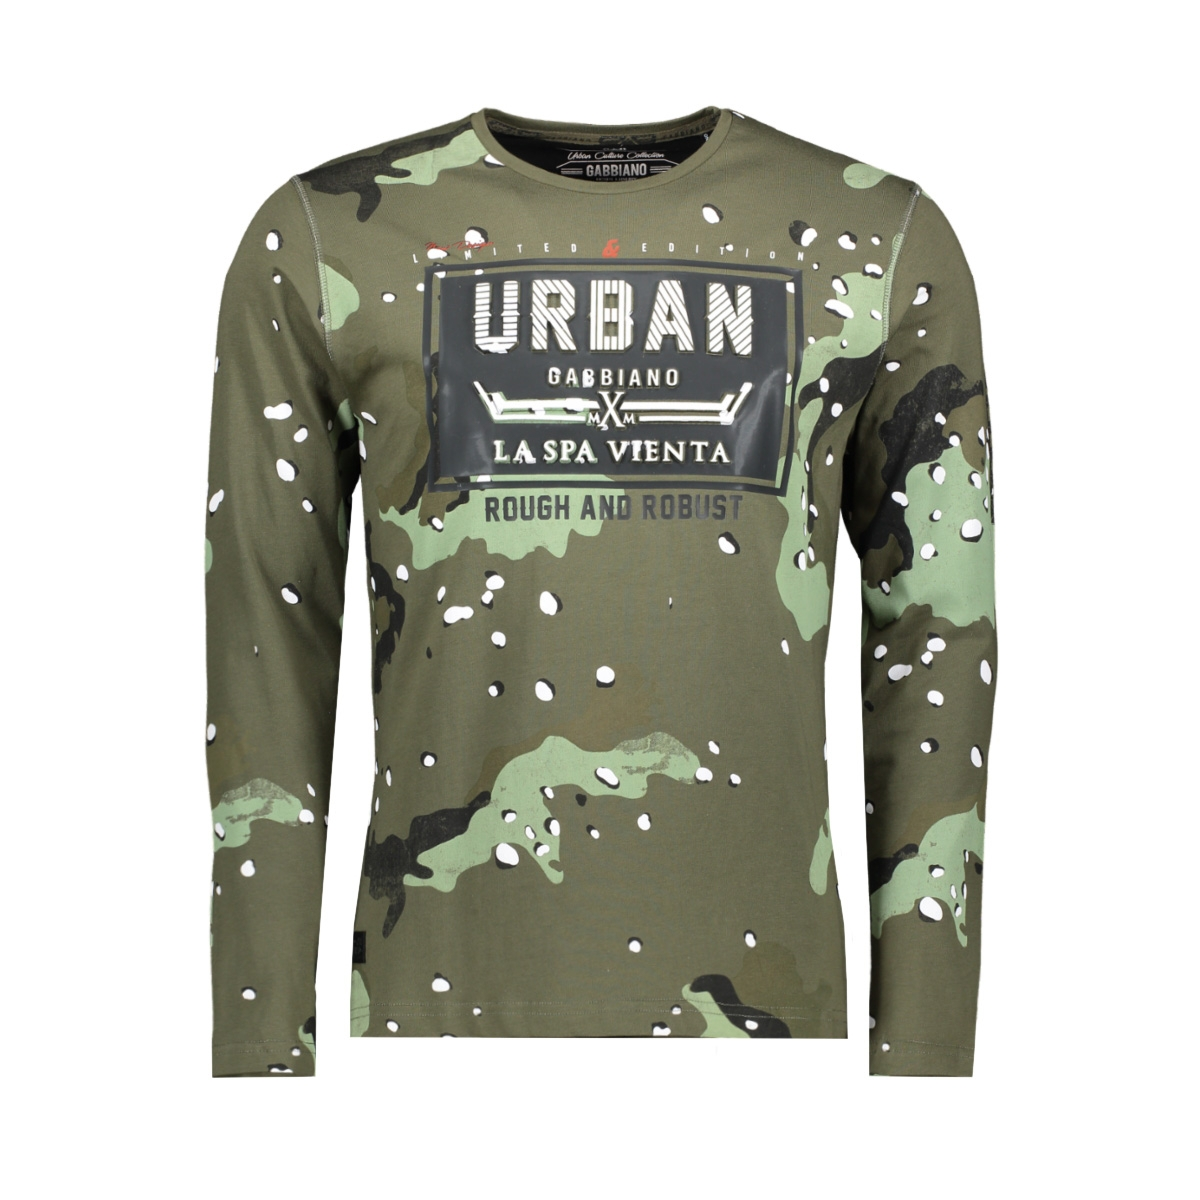 13858 gabbiano t-shirt army